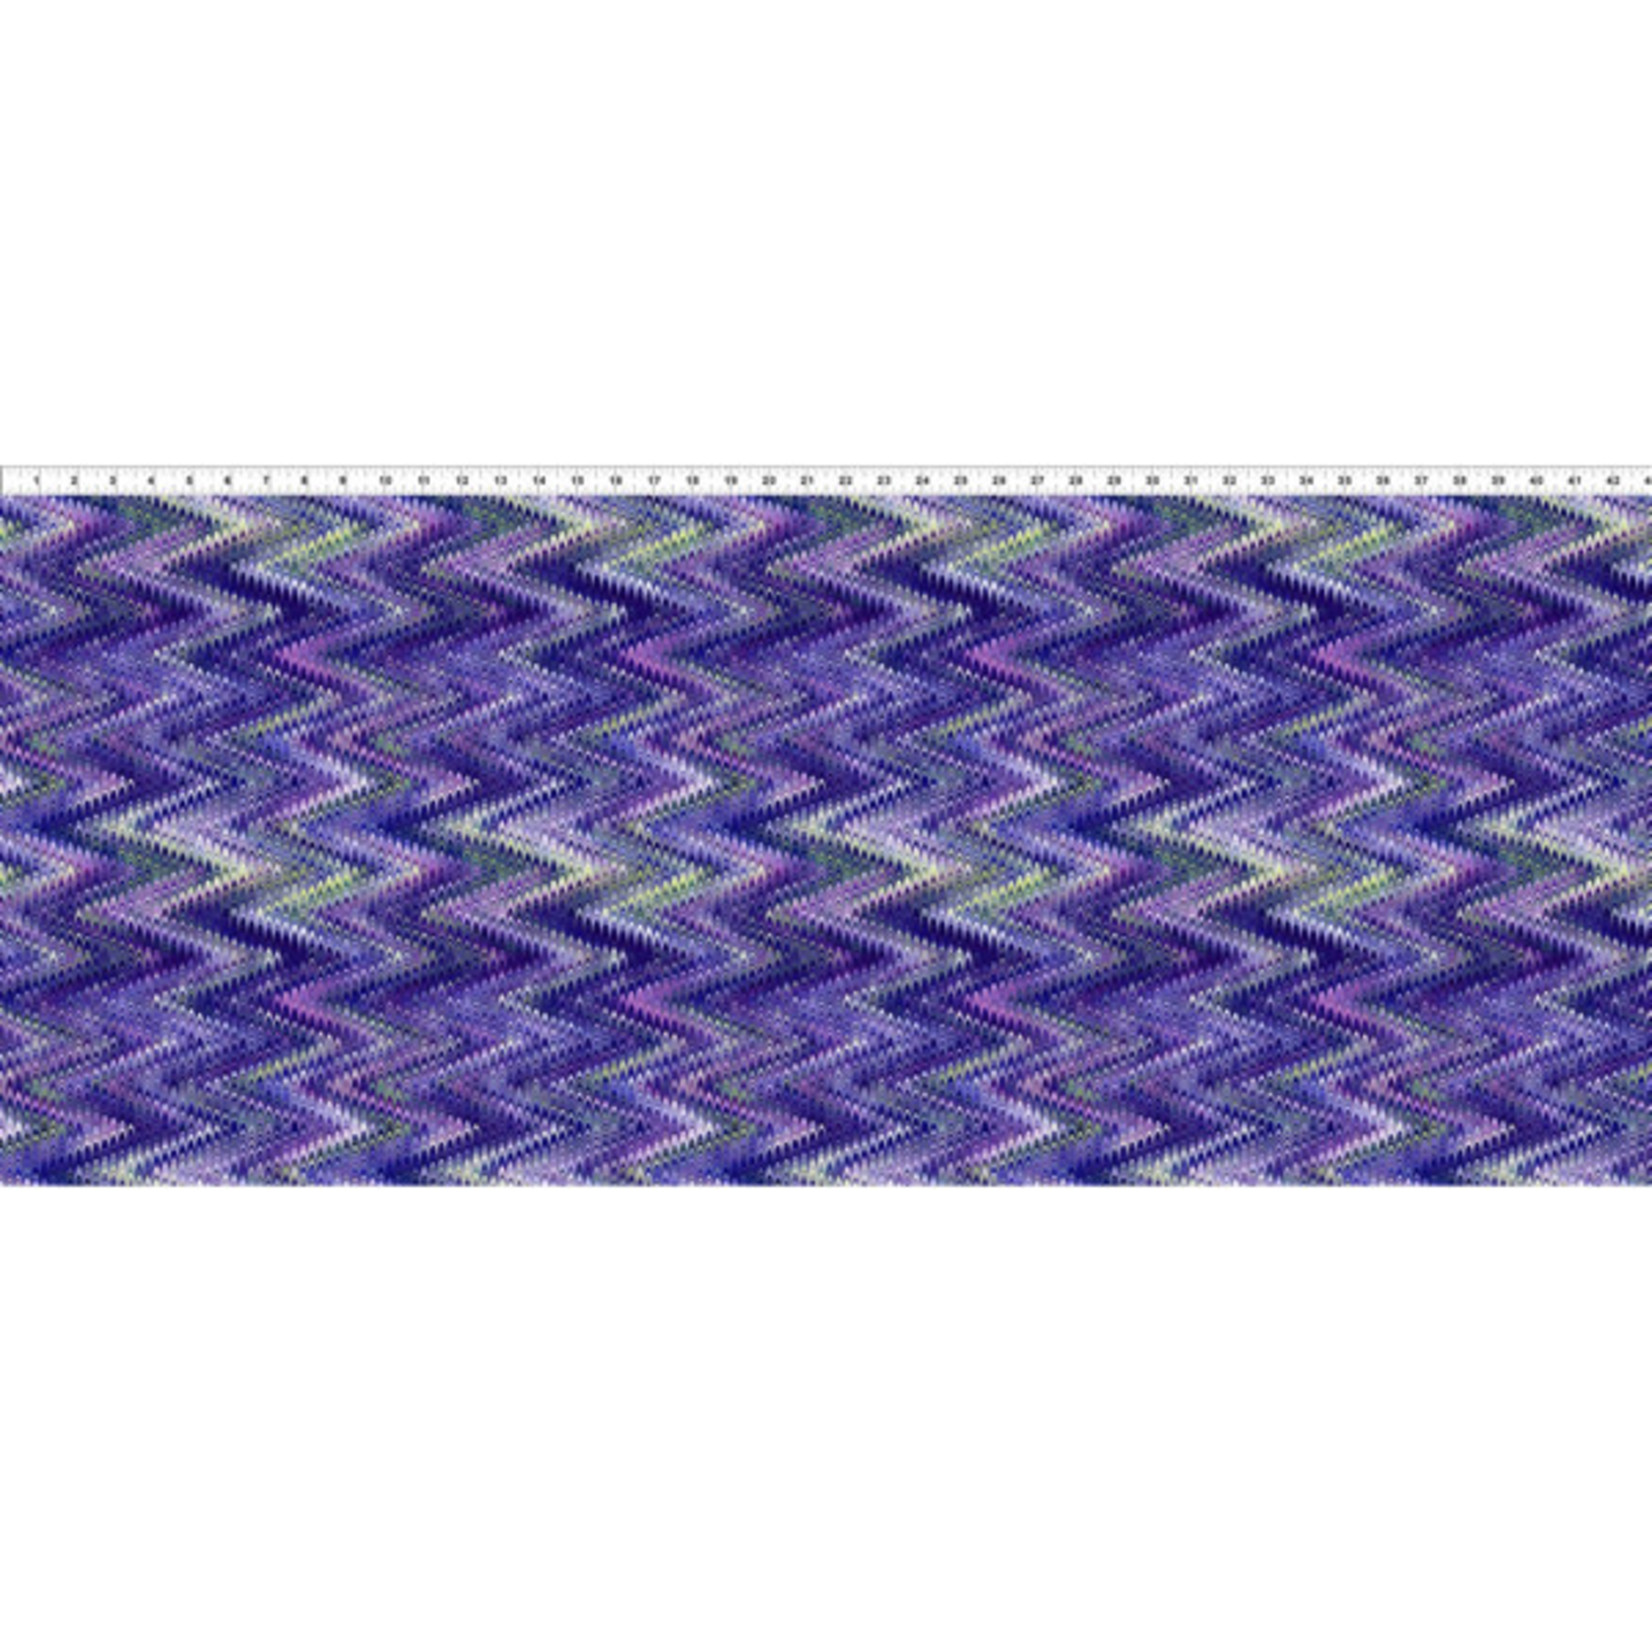 In the Beginning Fabrics Marble Essence - Torino - Purple